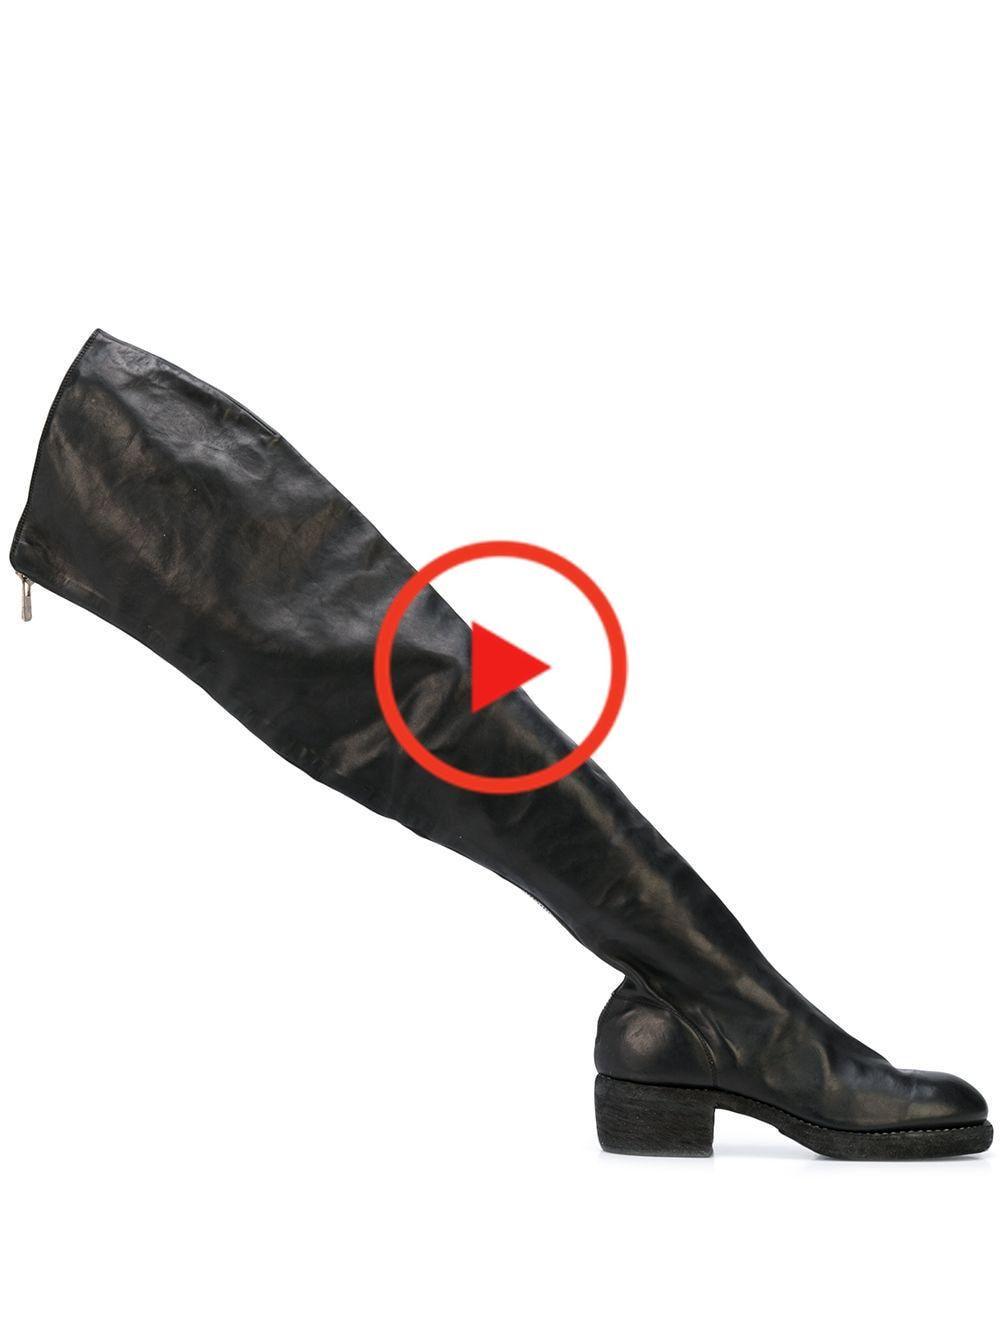 Guidi geritst dij hoge laarzen zwart cuissardes